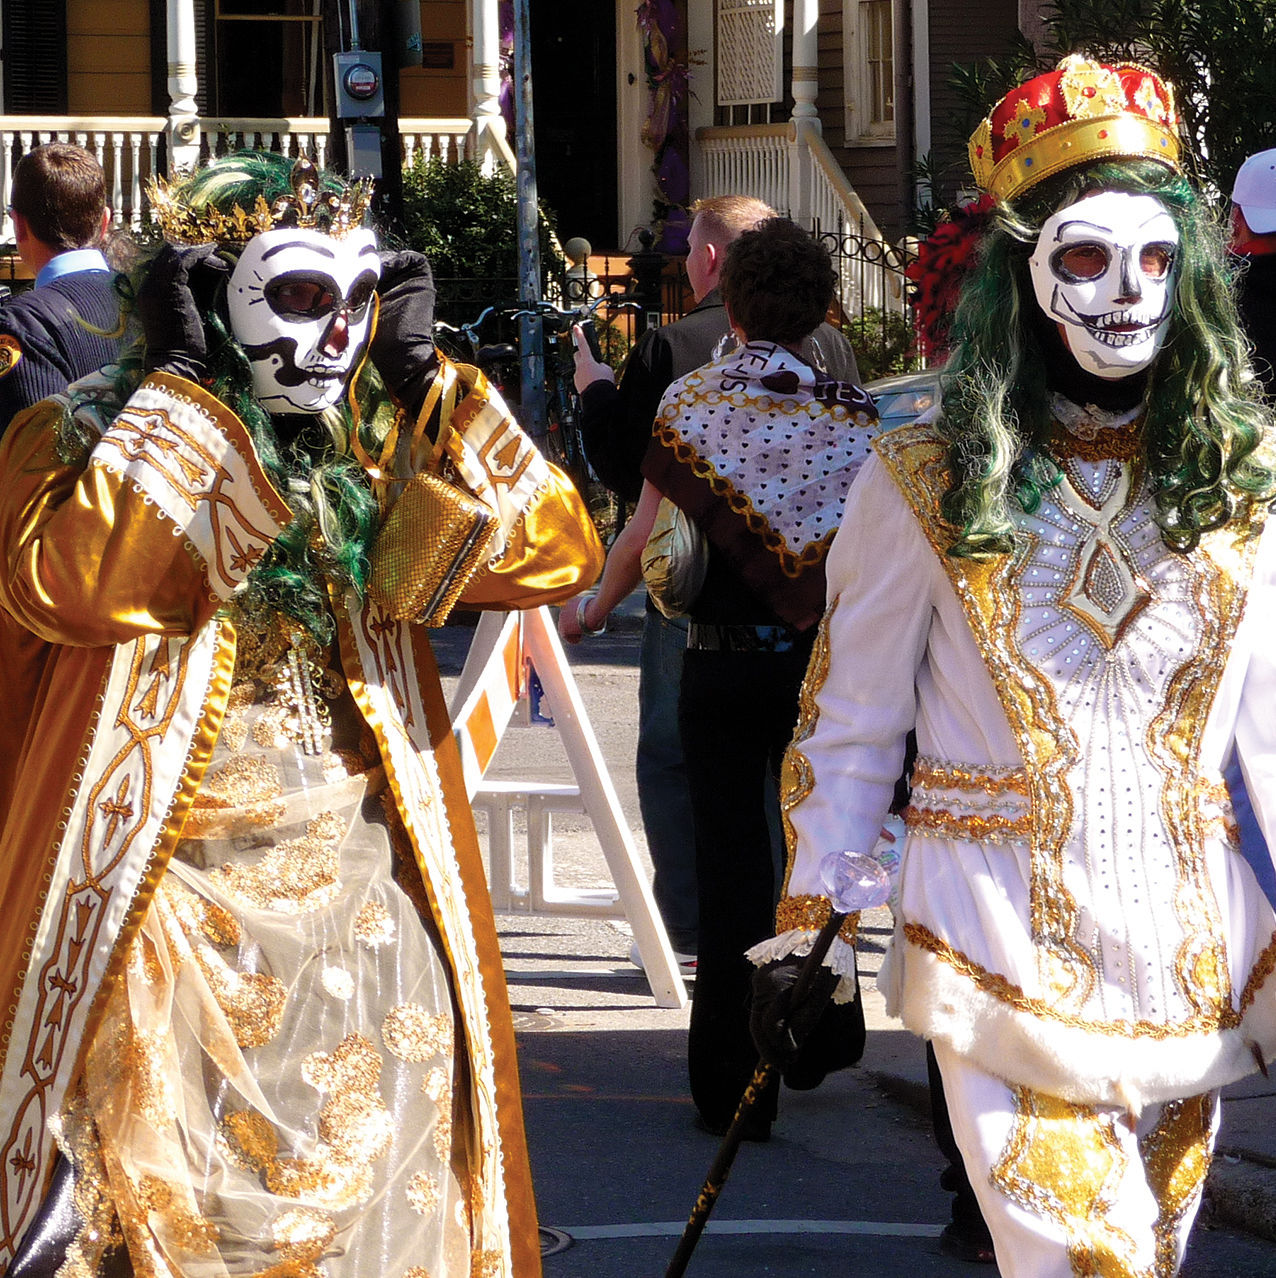 St. ann parade at mardi gras 2010 zxczzl